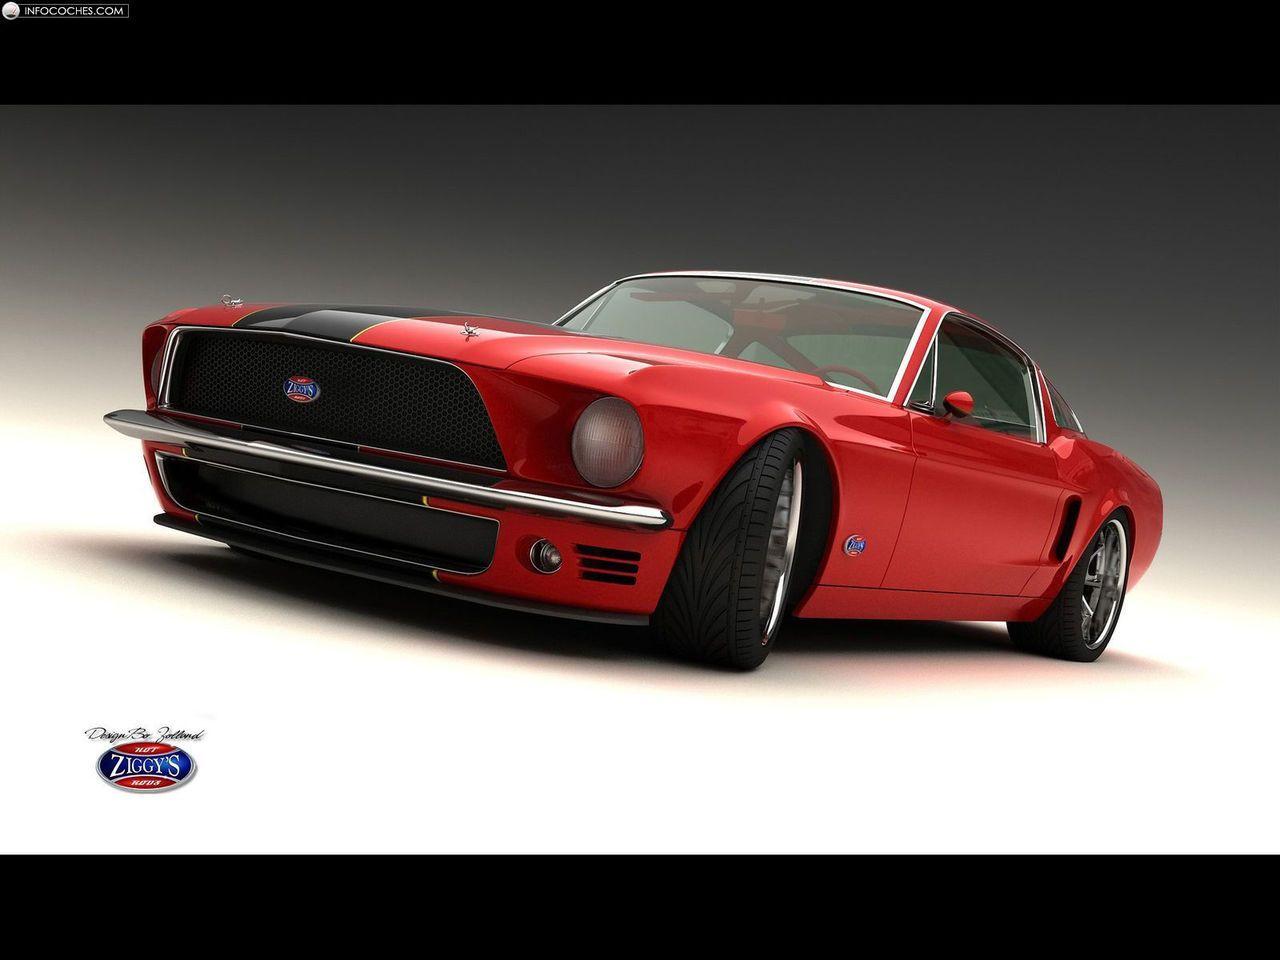 Fotos del Bo Zolland Classic Mustang Fastback Vizualtech - 3 / 6